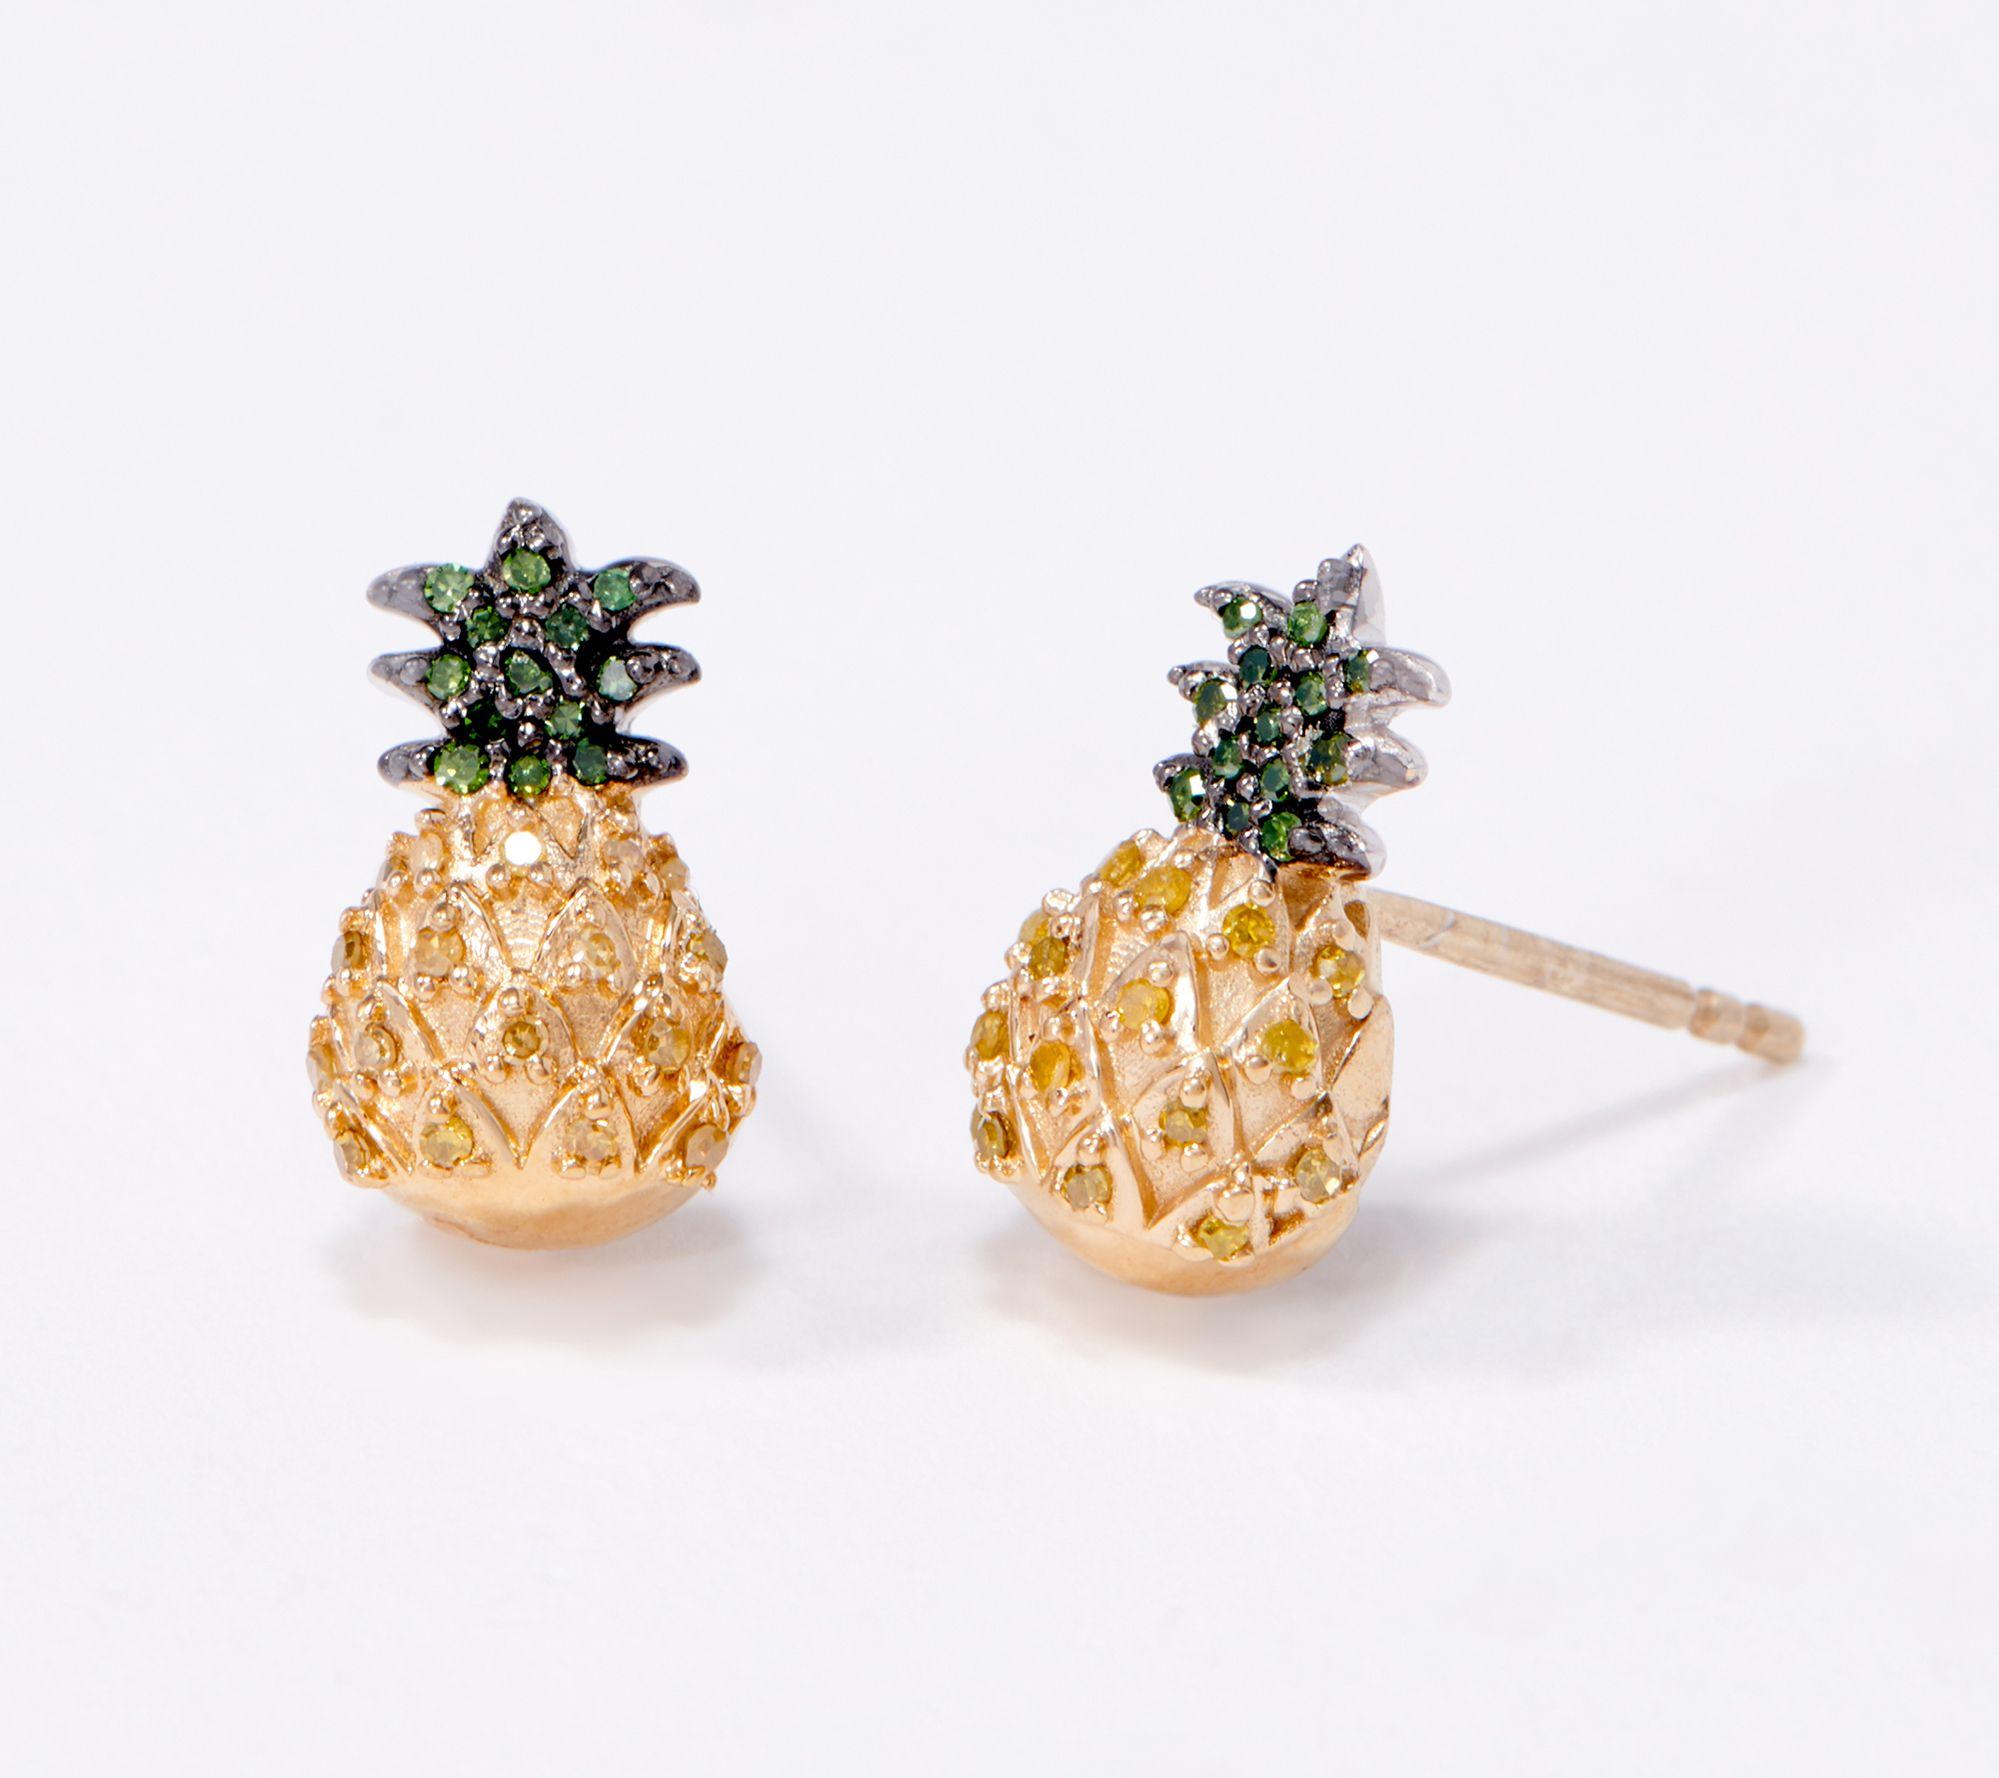 50% off adorable pineapple stud earrings